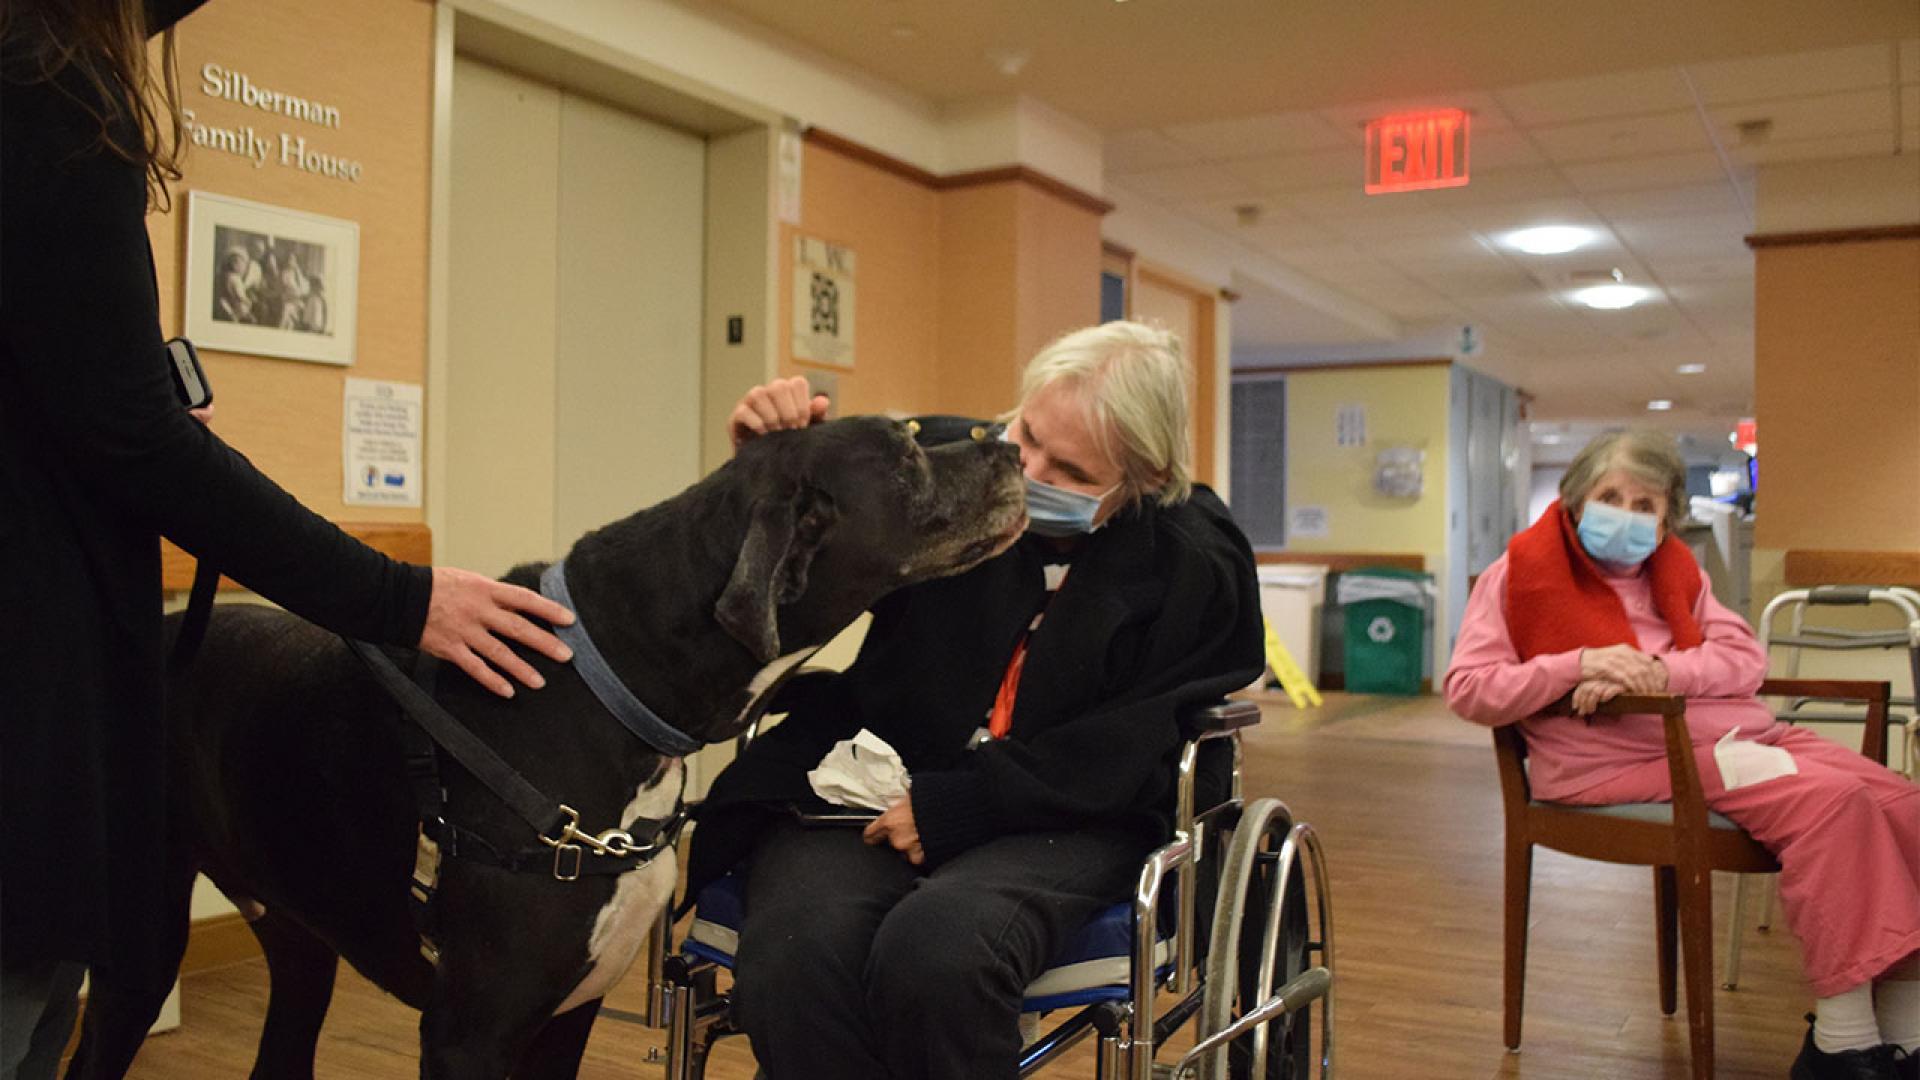 Resident Sheryl Gerdwagen pets Marley, the great dane, as resident Ethel Brown enjoys watching from afar